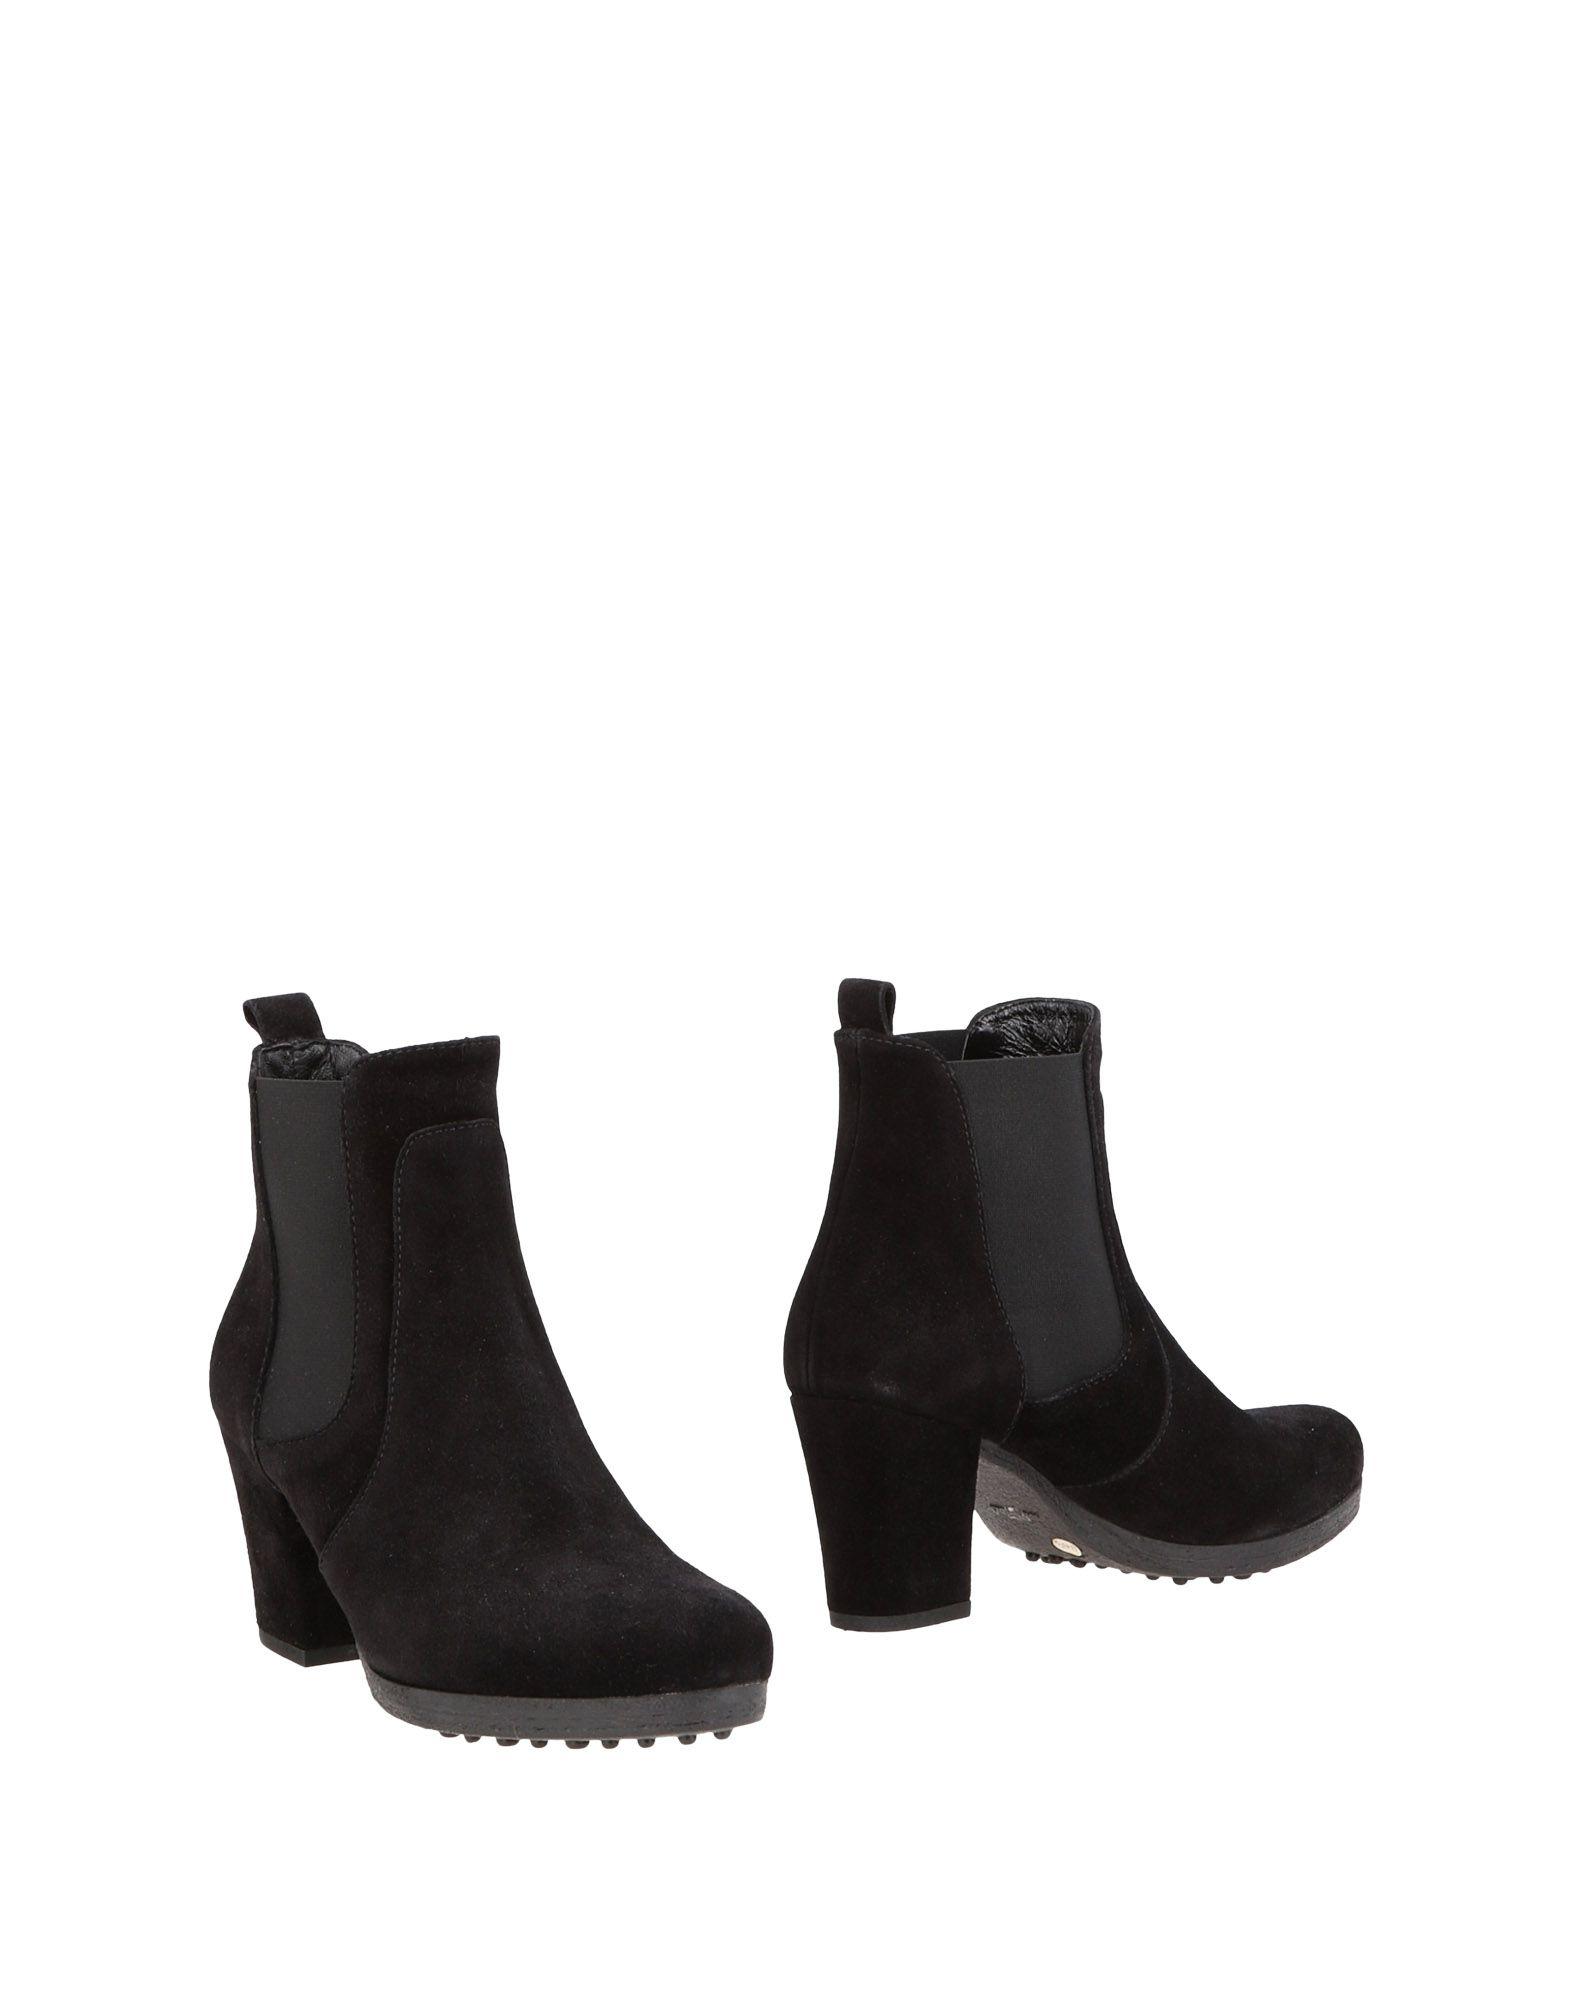 Chelsea Boots 11495293BX Maria Cristina Donna - 11495293BX Boots 1b9748